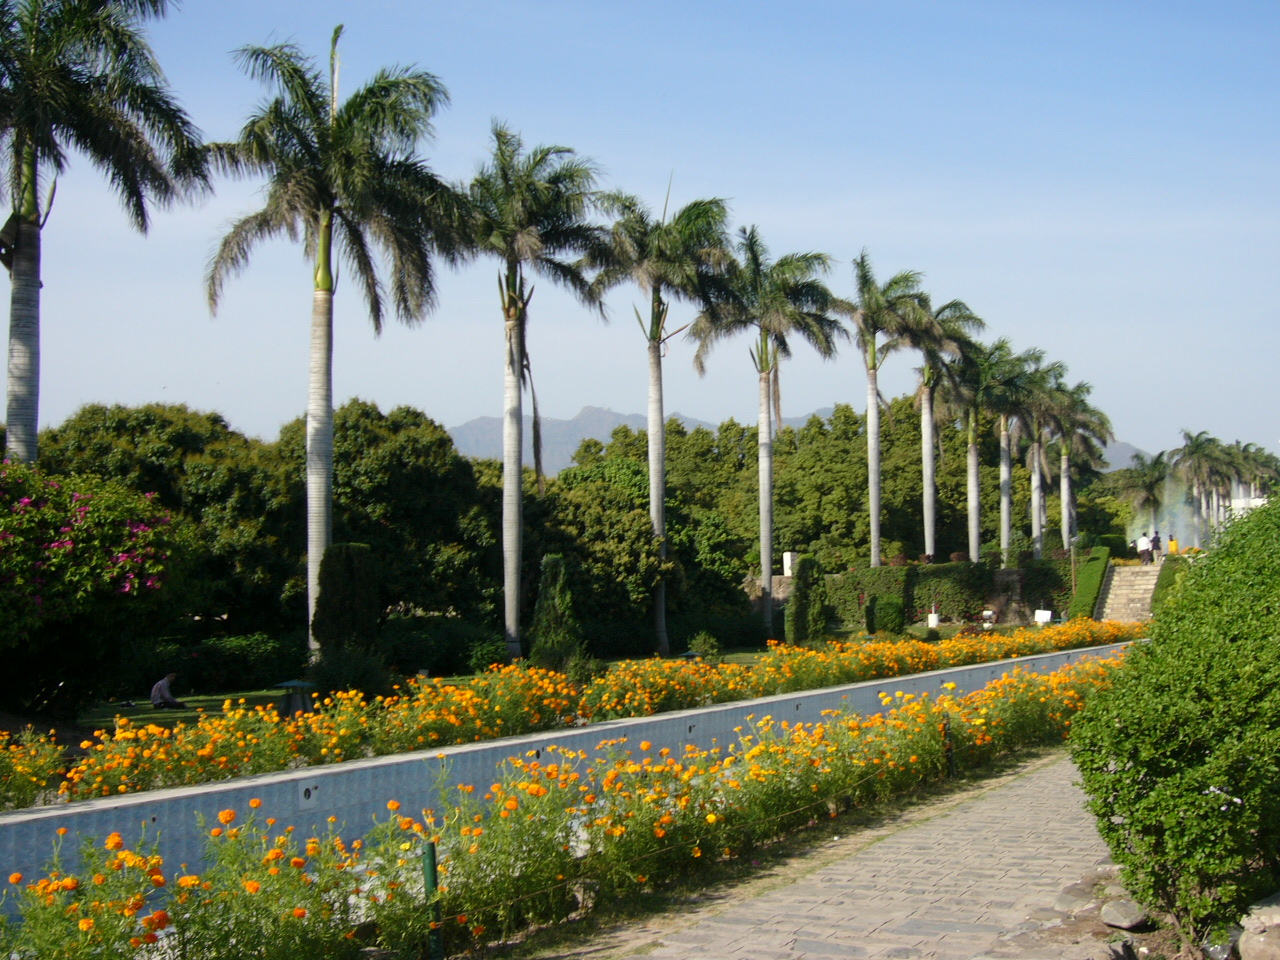 Chandigarh India  city images : Description Pinjore Garden Chandigarh India 9